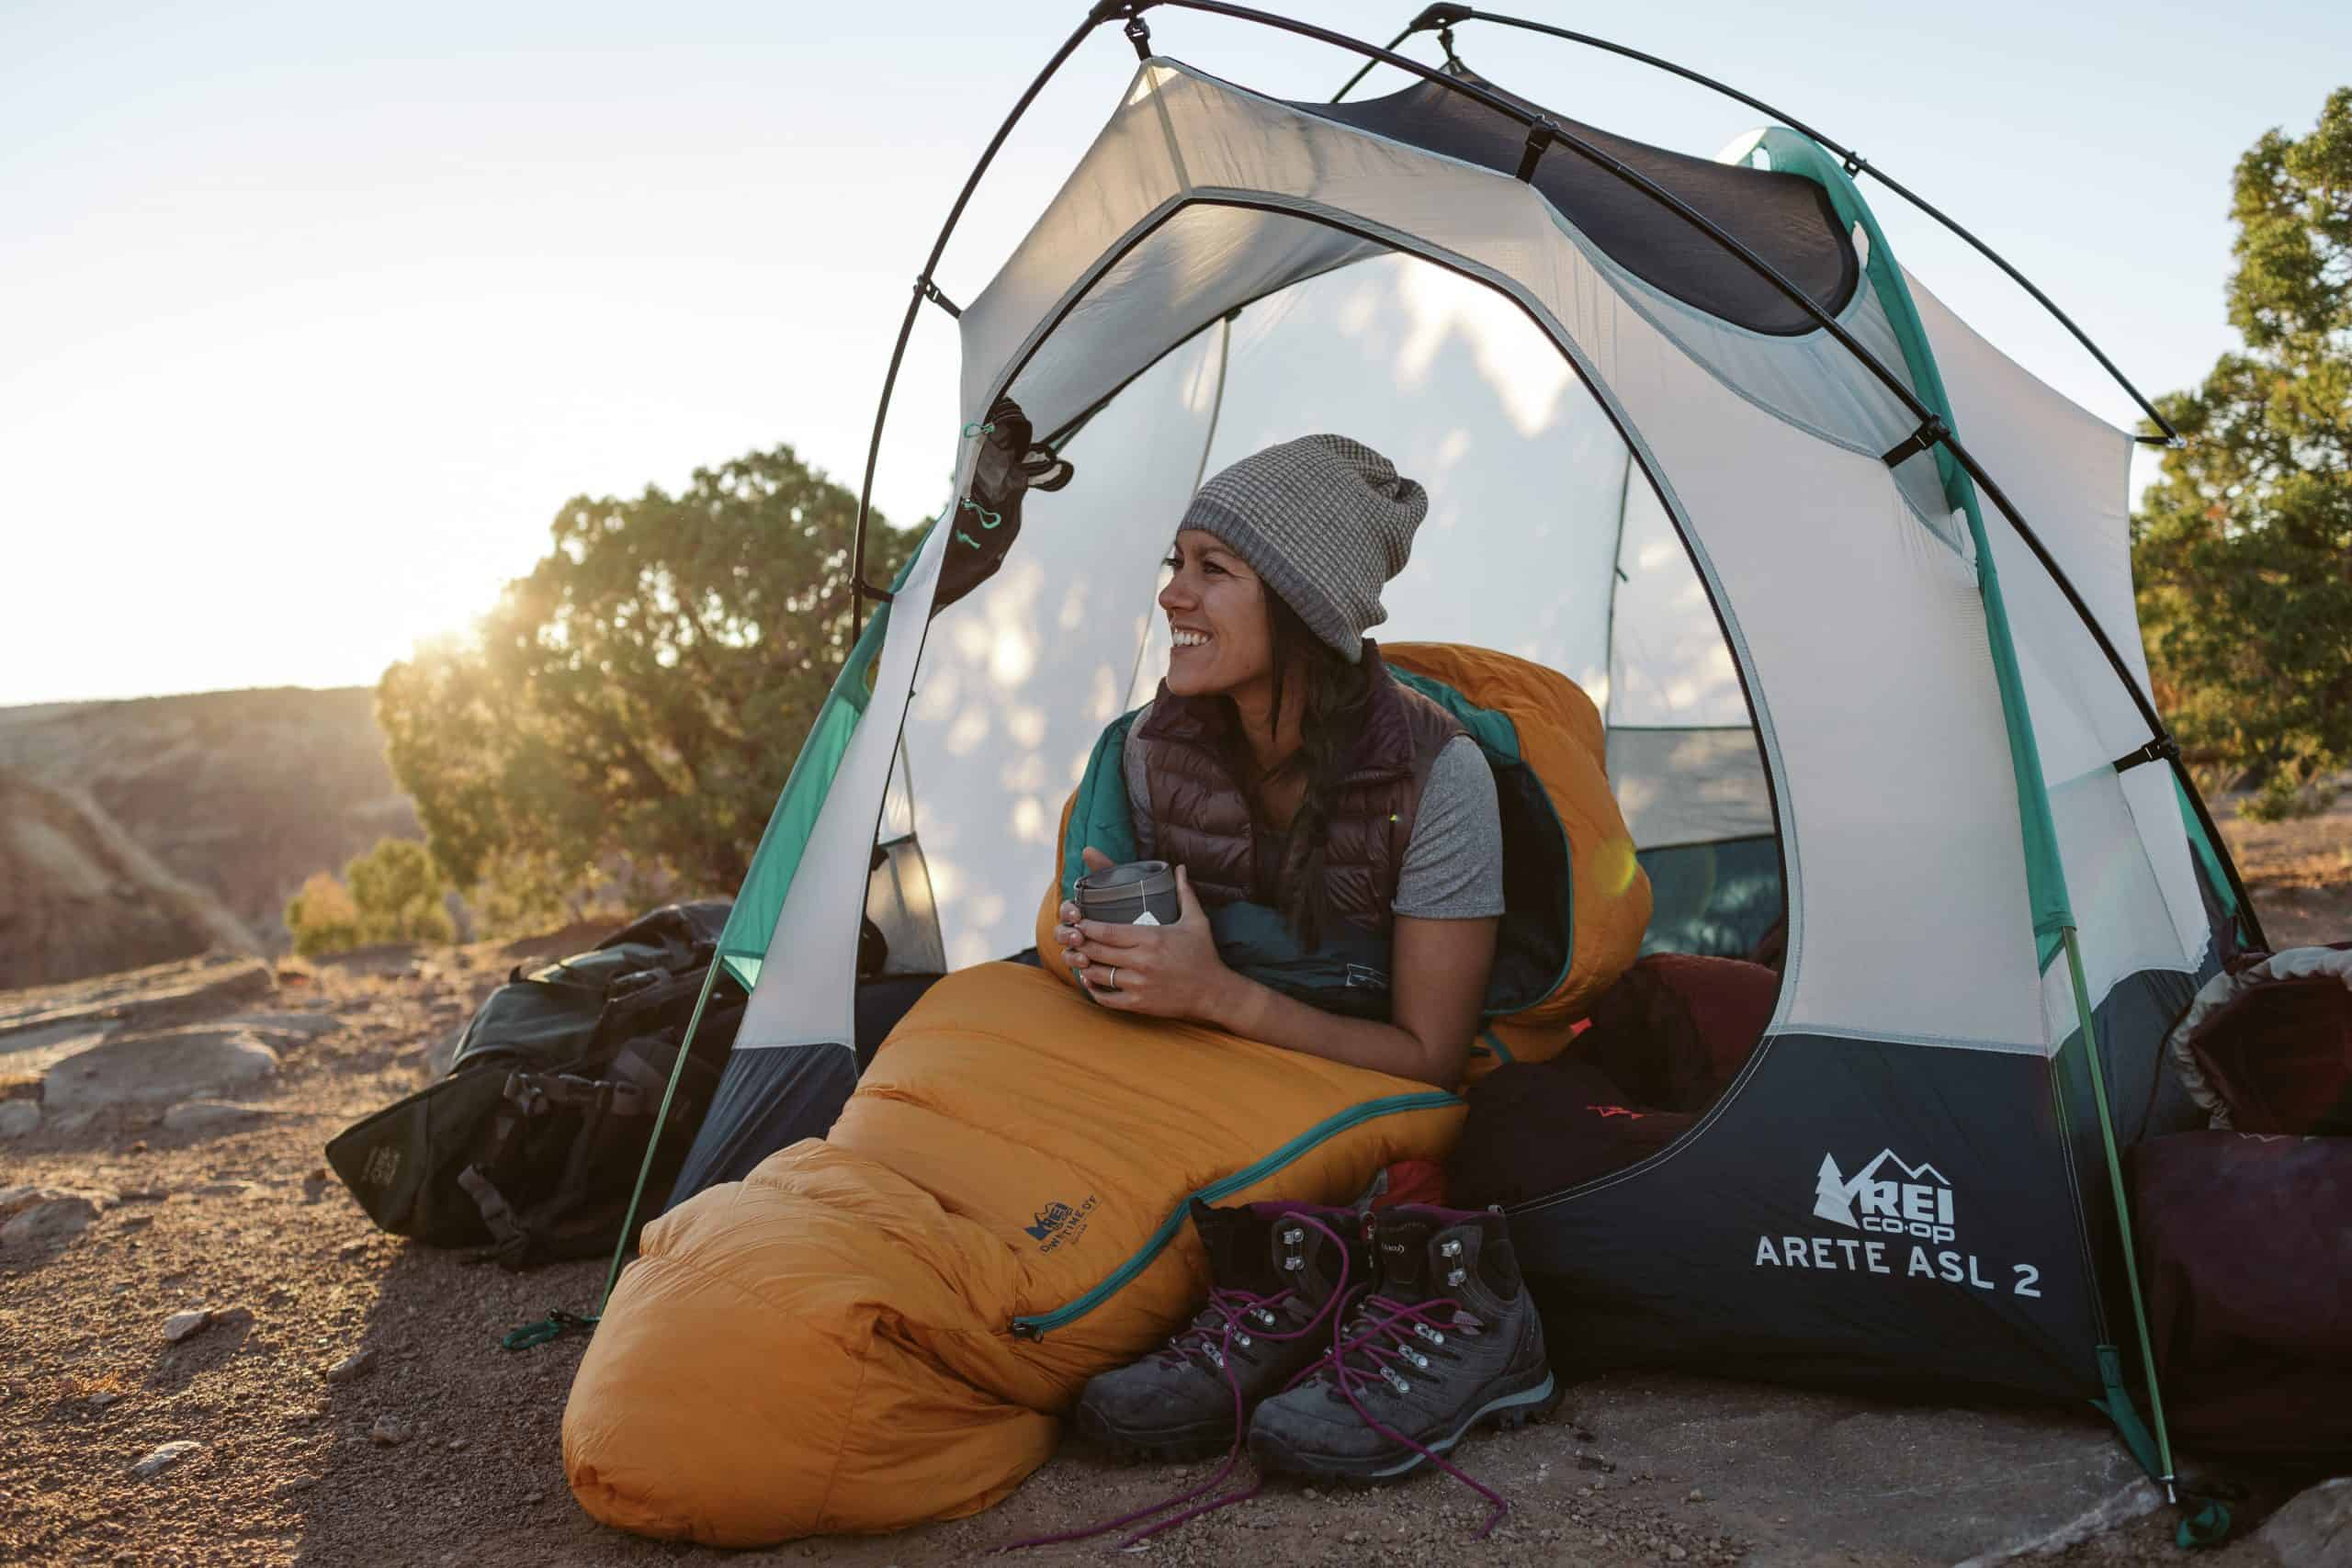 Used outdoor gear - Woman in sleeping bag sitting in doorway of tent with her rented REI gear